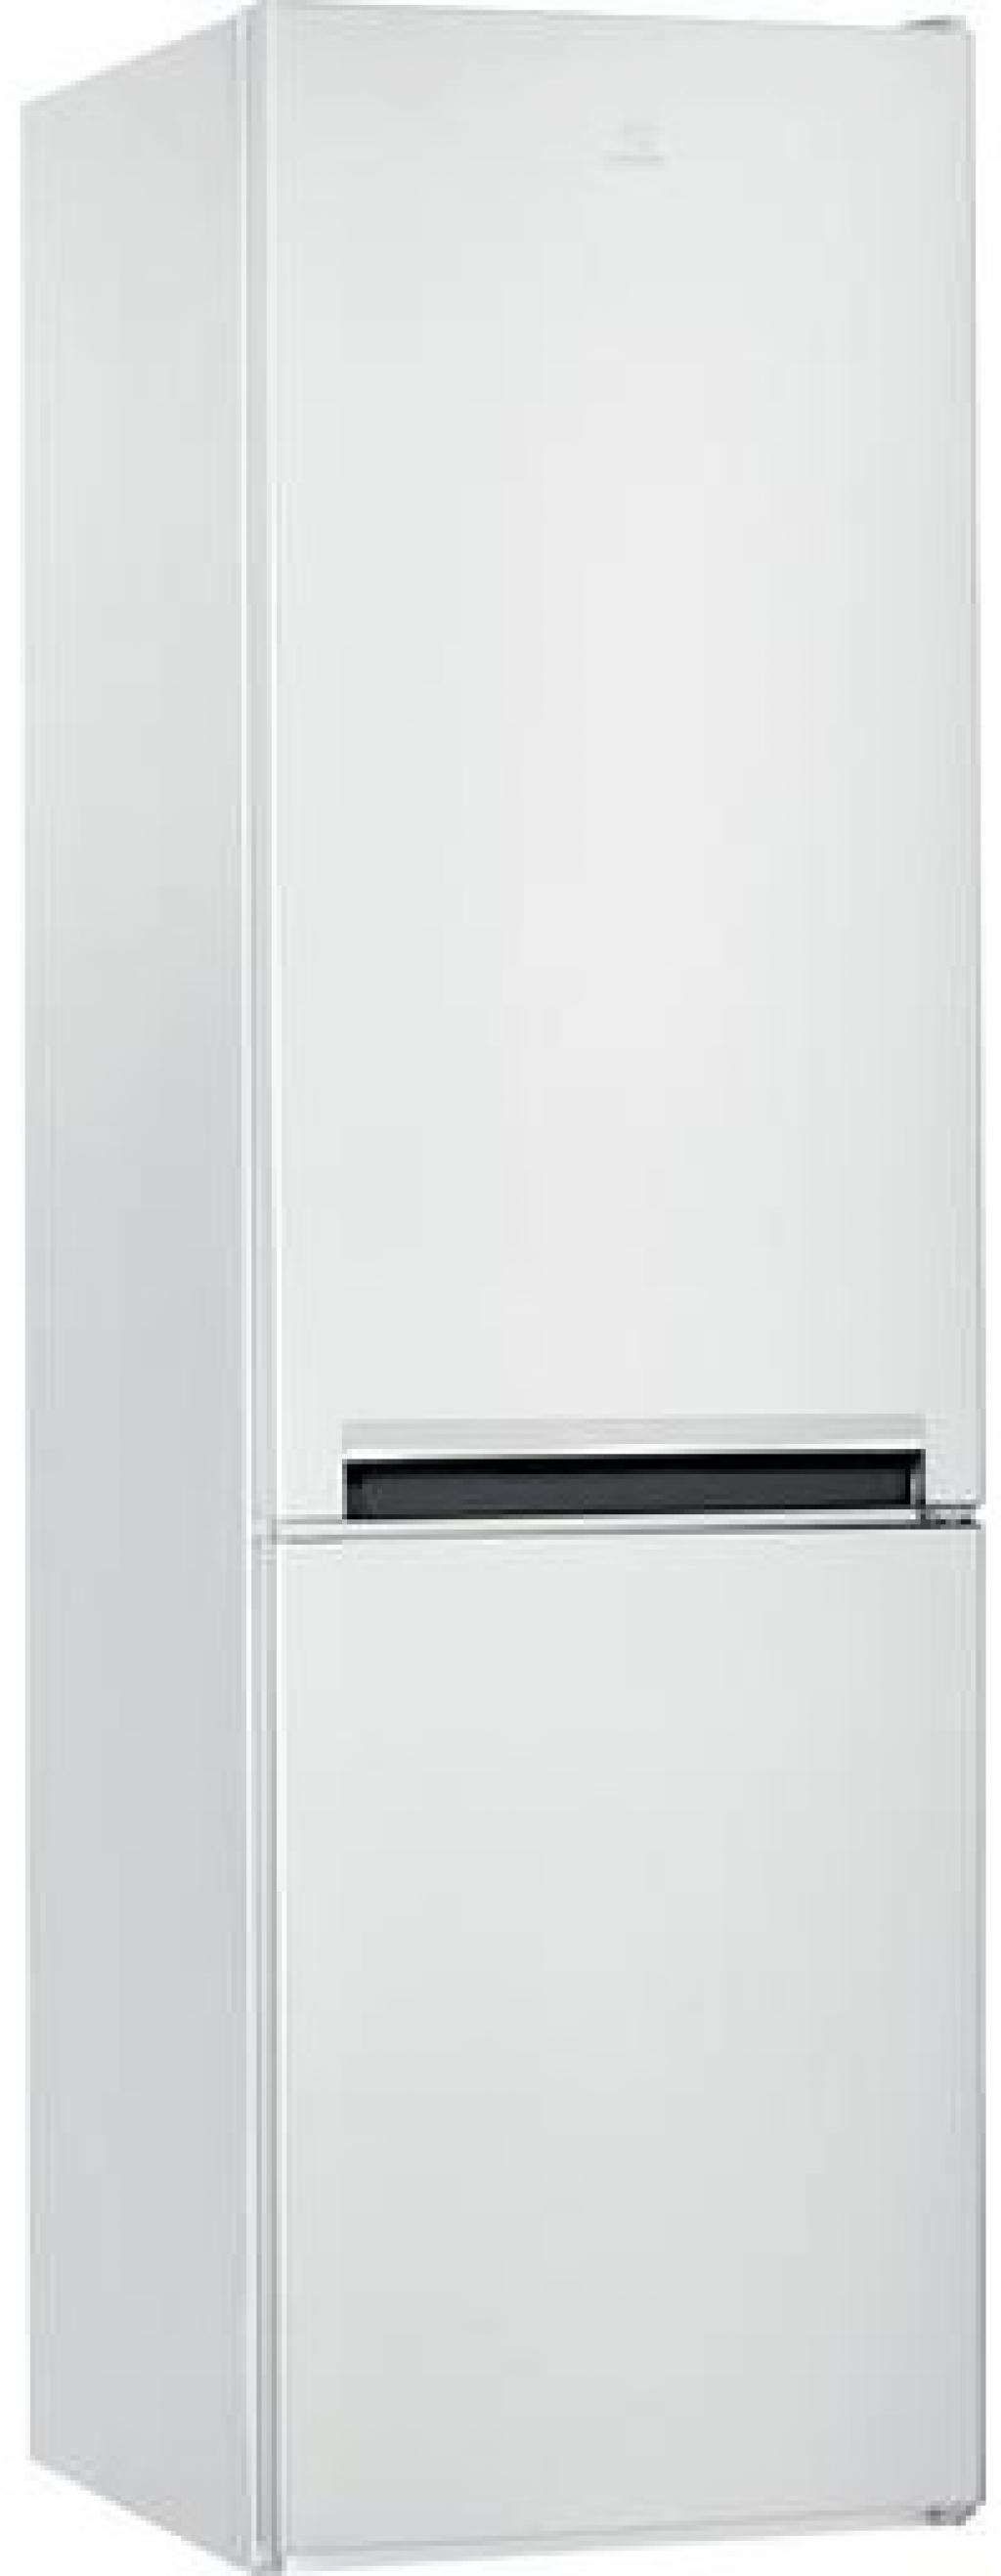 Хладилник с фризер Indesit LI9S1EW